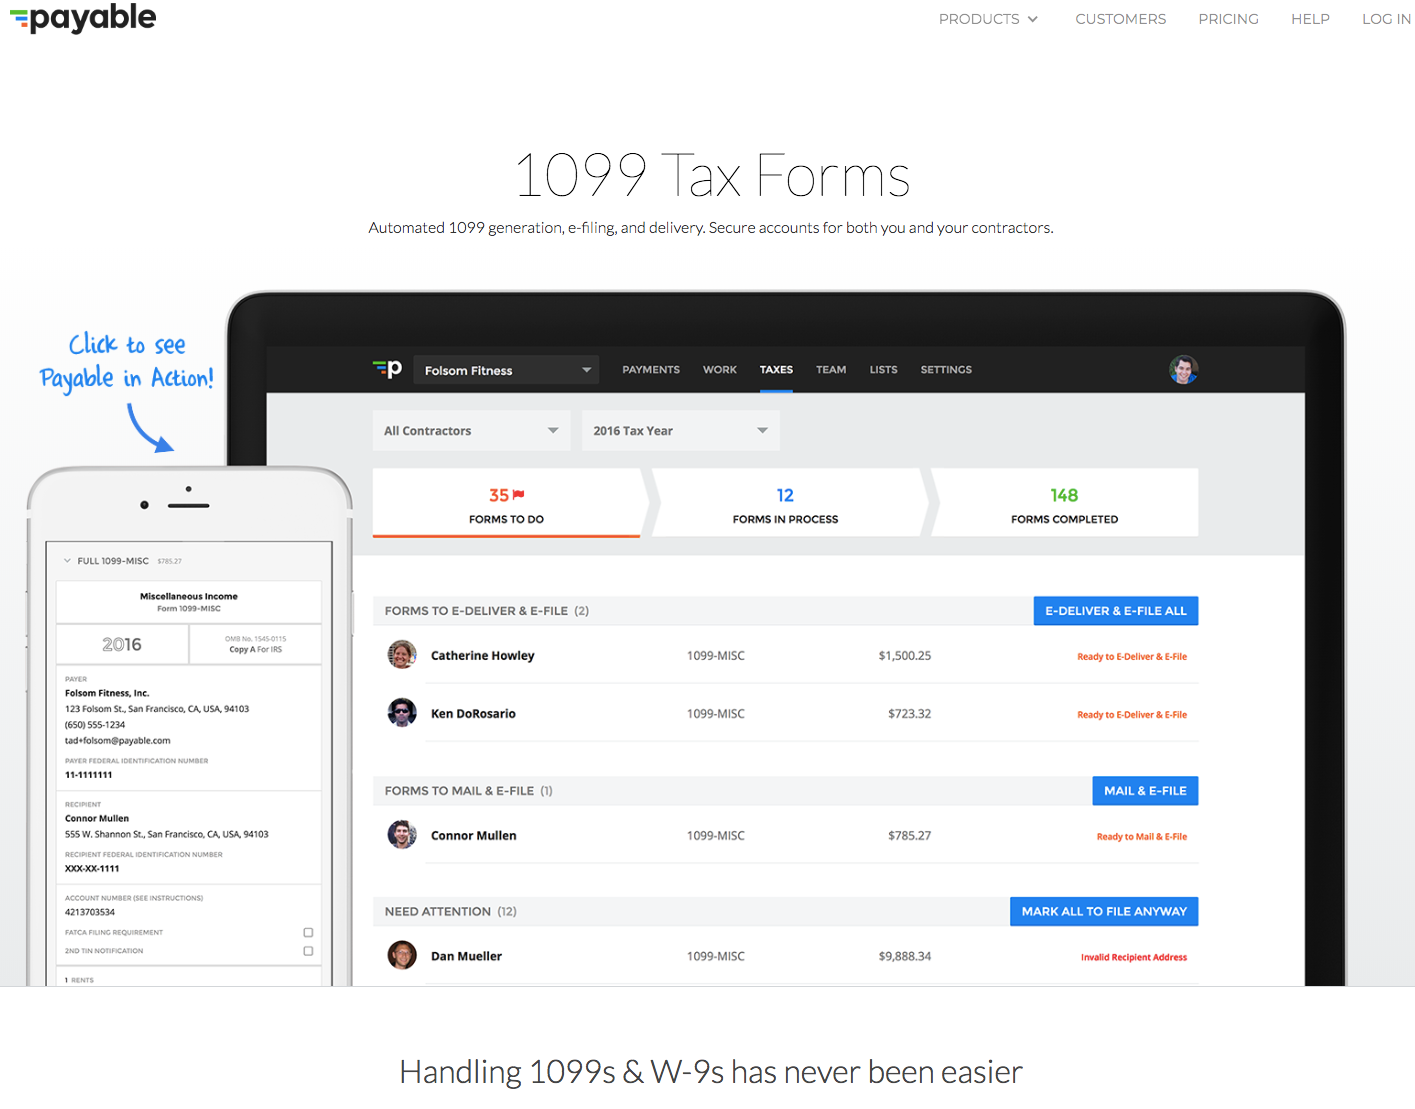 Payable homepage.